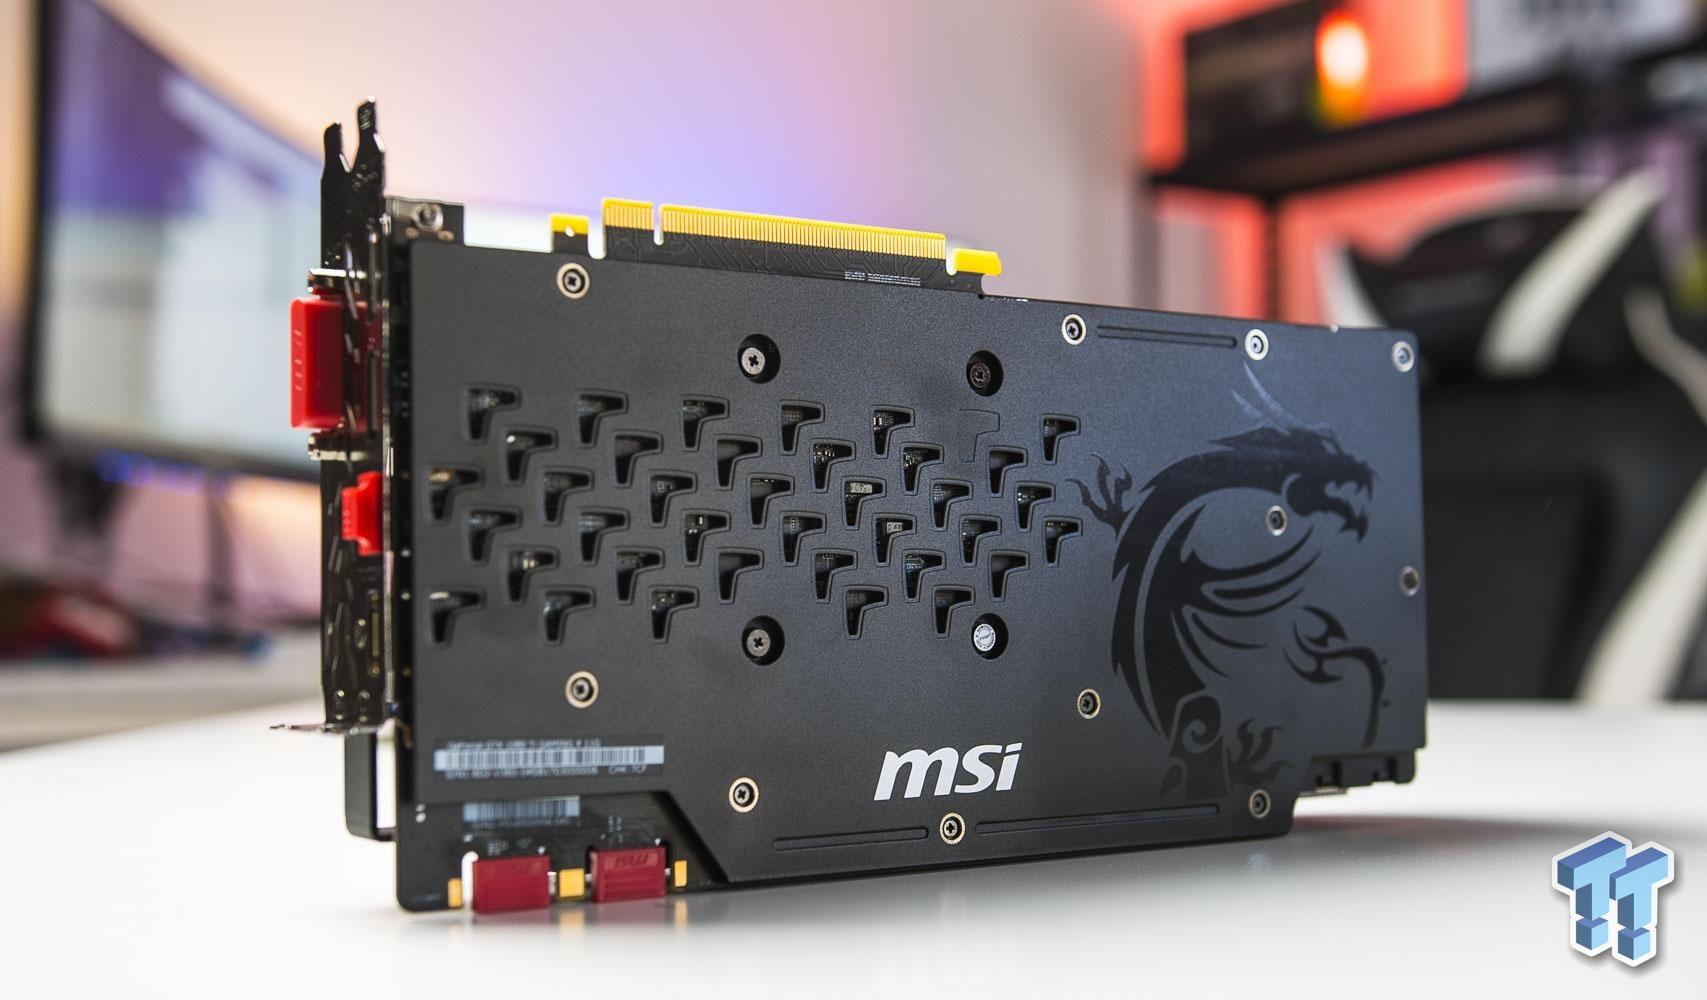 Msi Geforce Gtx 1080 Ti Gaming X 11g Is The New 4k King Msi Games King